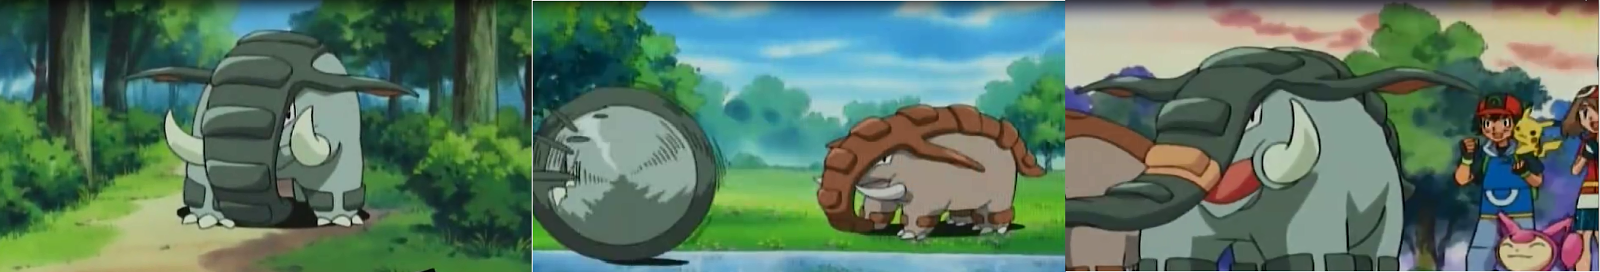 Pokemon Capitulo 22 Temporada 8 La Fecha Esperada